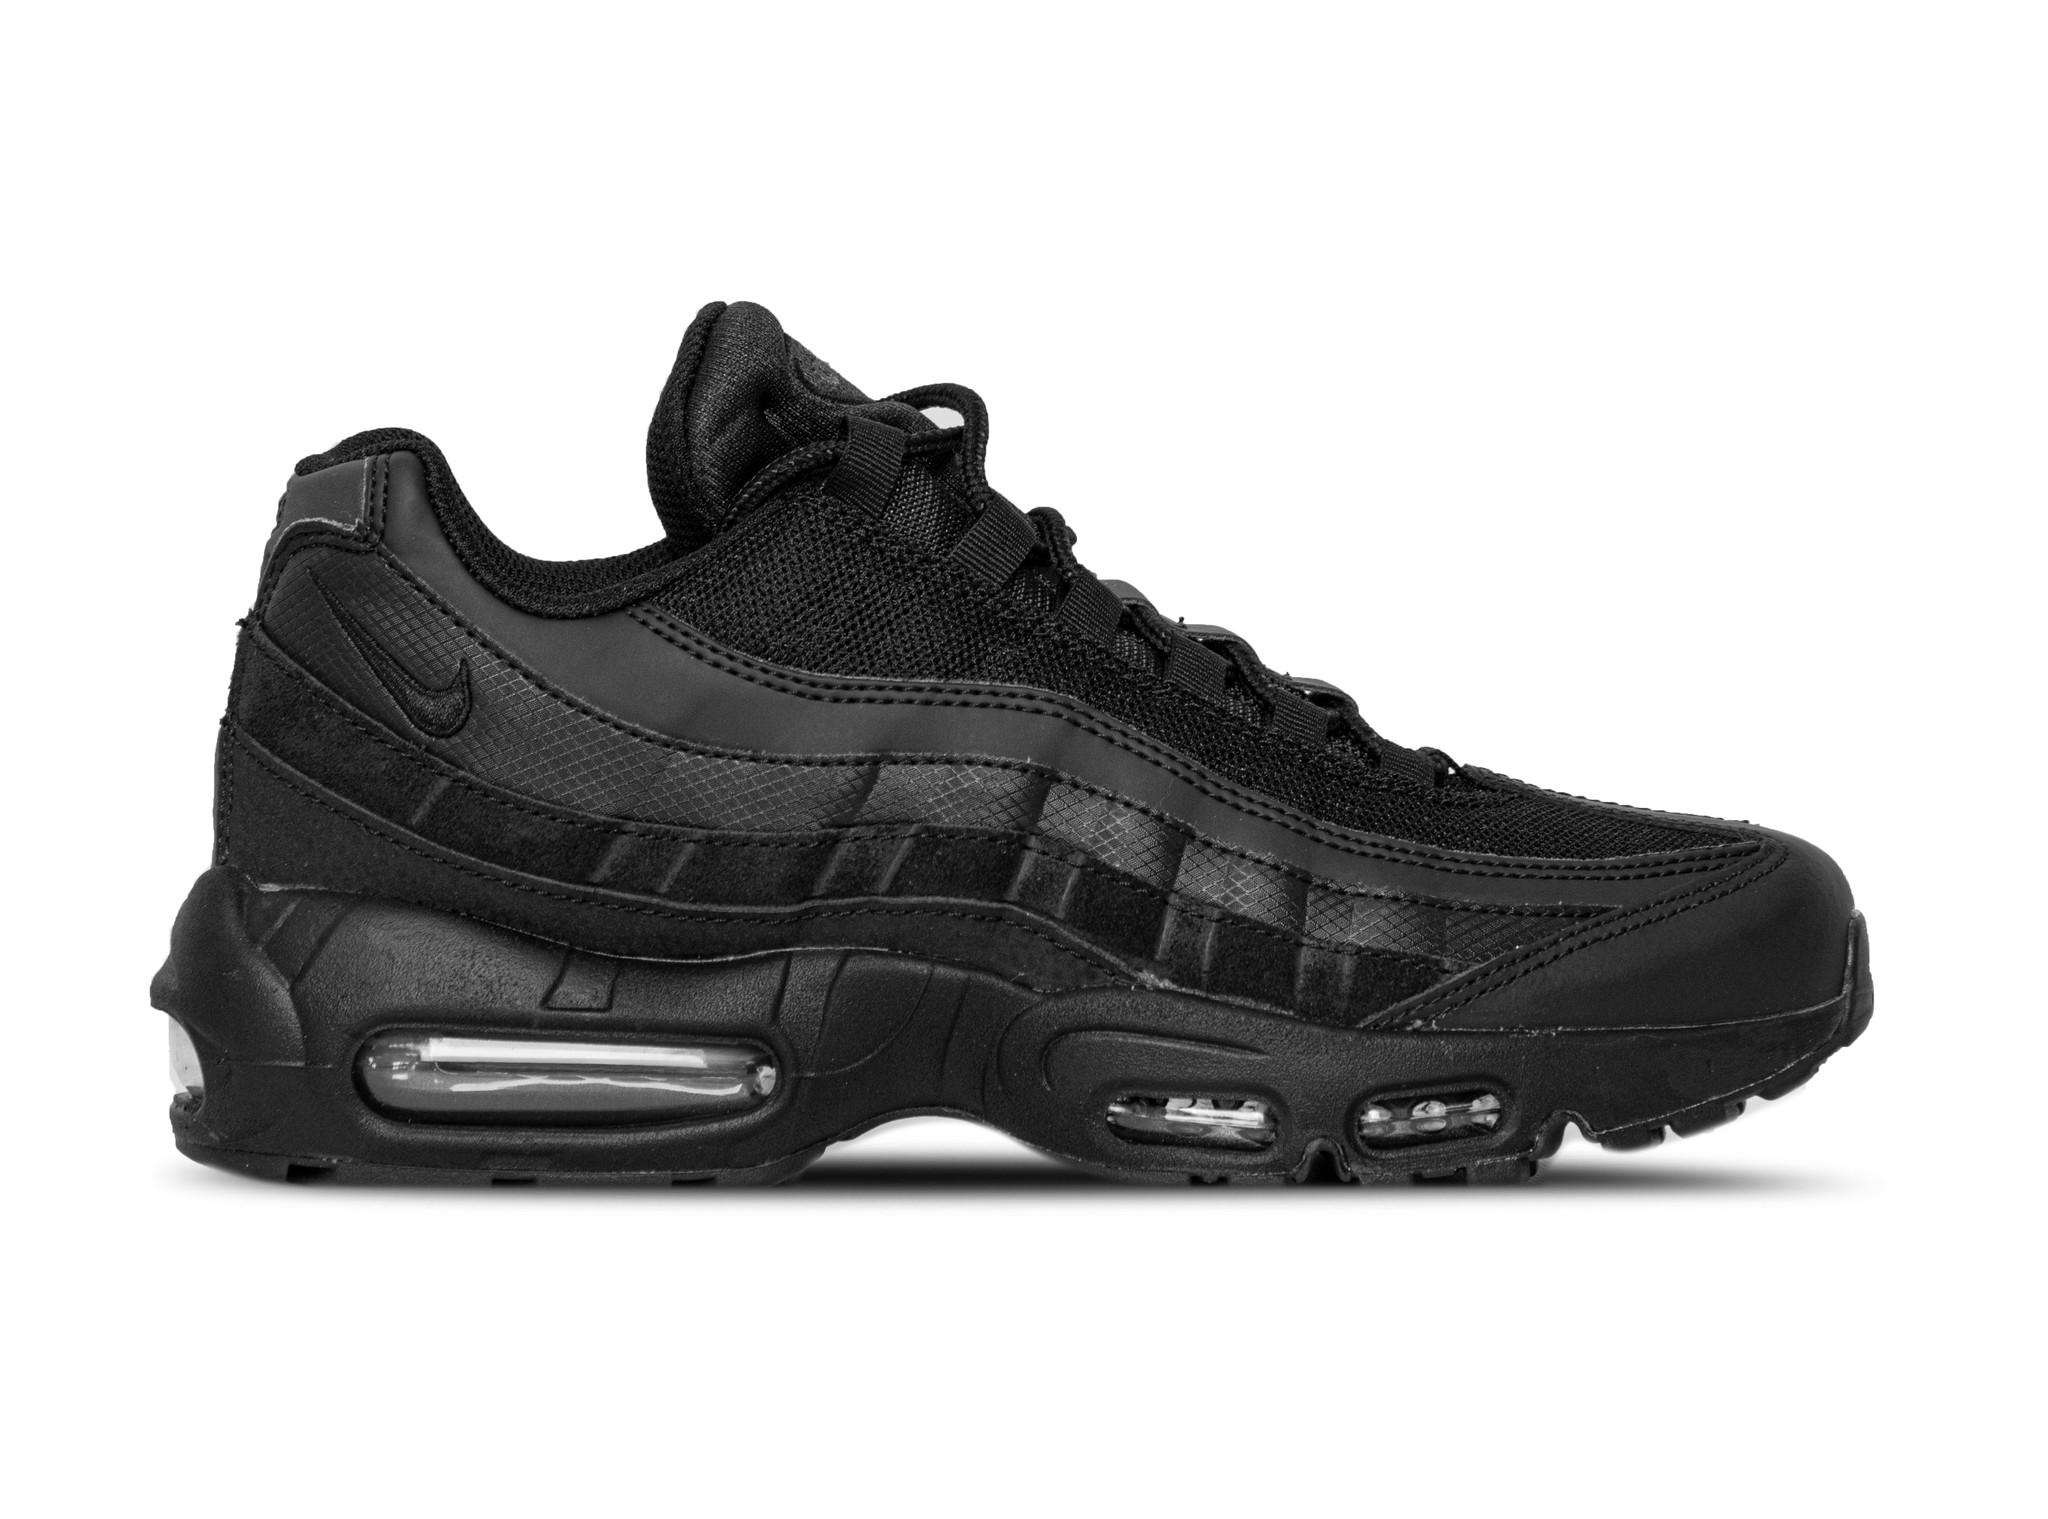 Nike Air Max 95 Essential Black Black Dark Grey CI3705 001 | Bruut Online shop